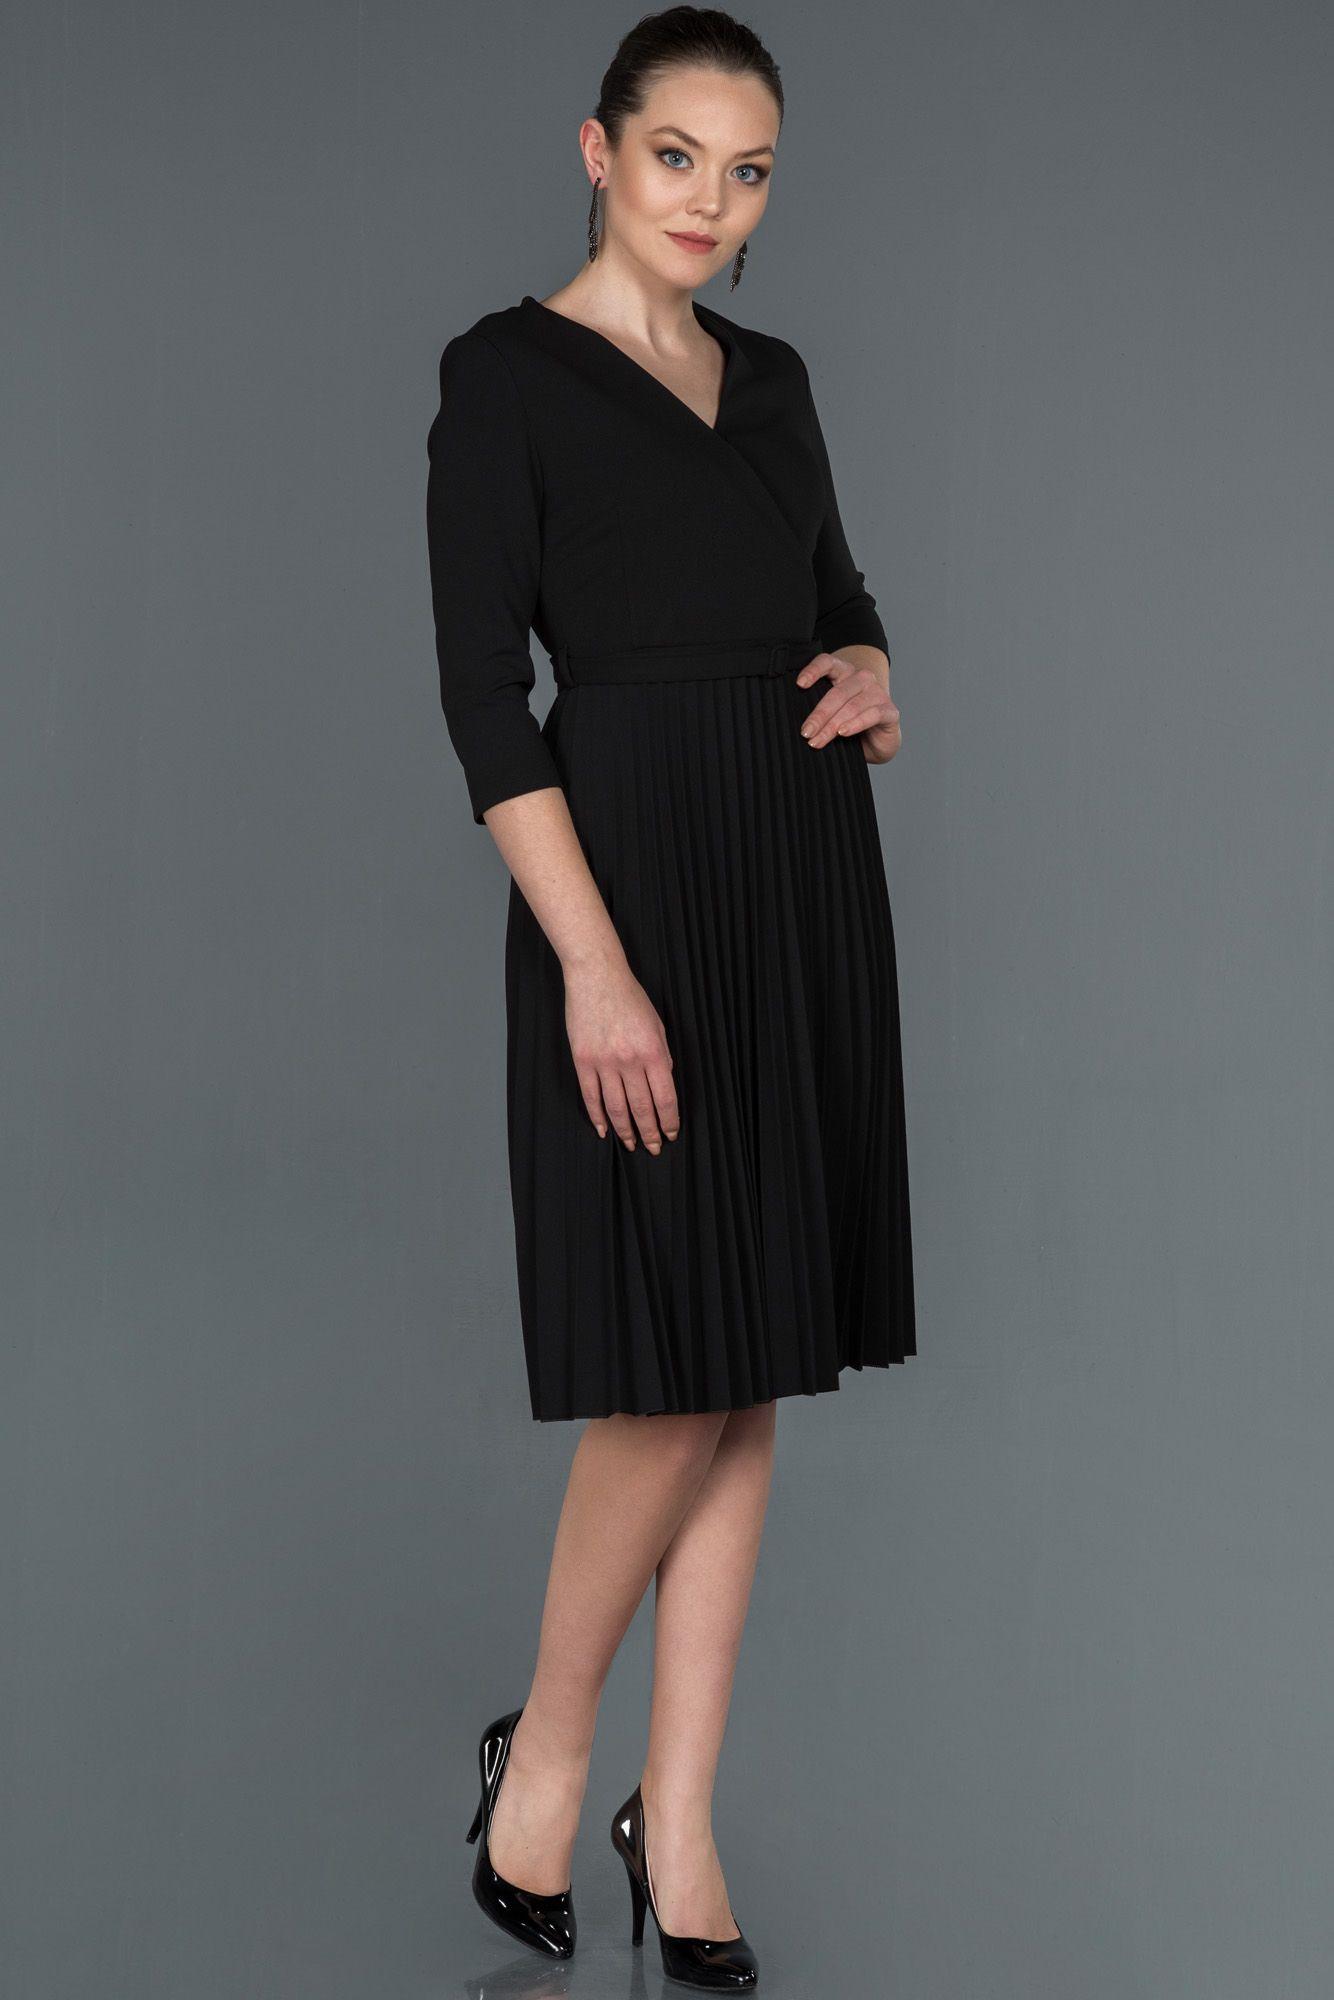 Siyah Kruvaze Yaka Ates Pile Elbise Abk748 2020 Aksamustu Giysileri Elbise Midi Elbise